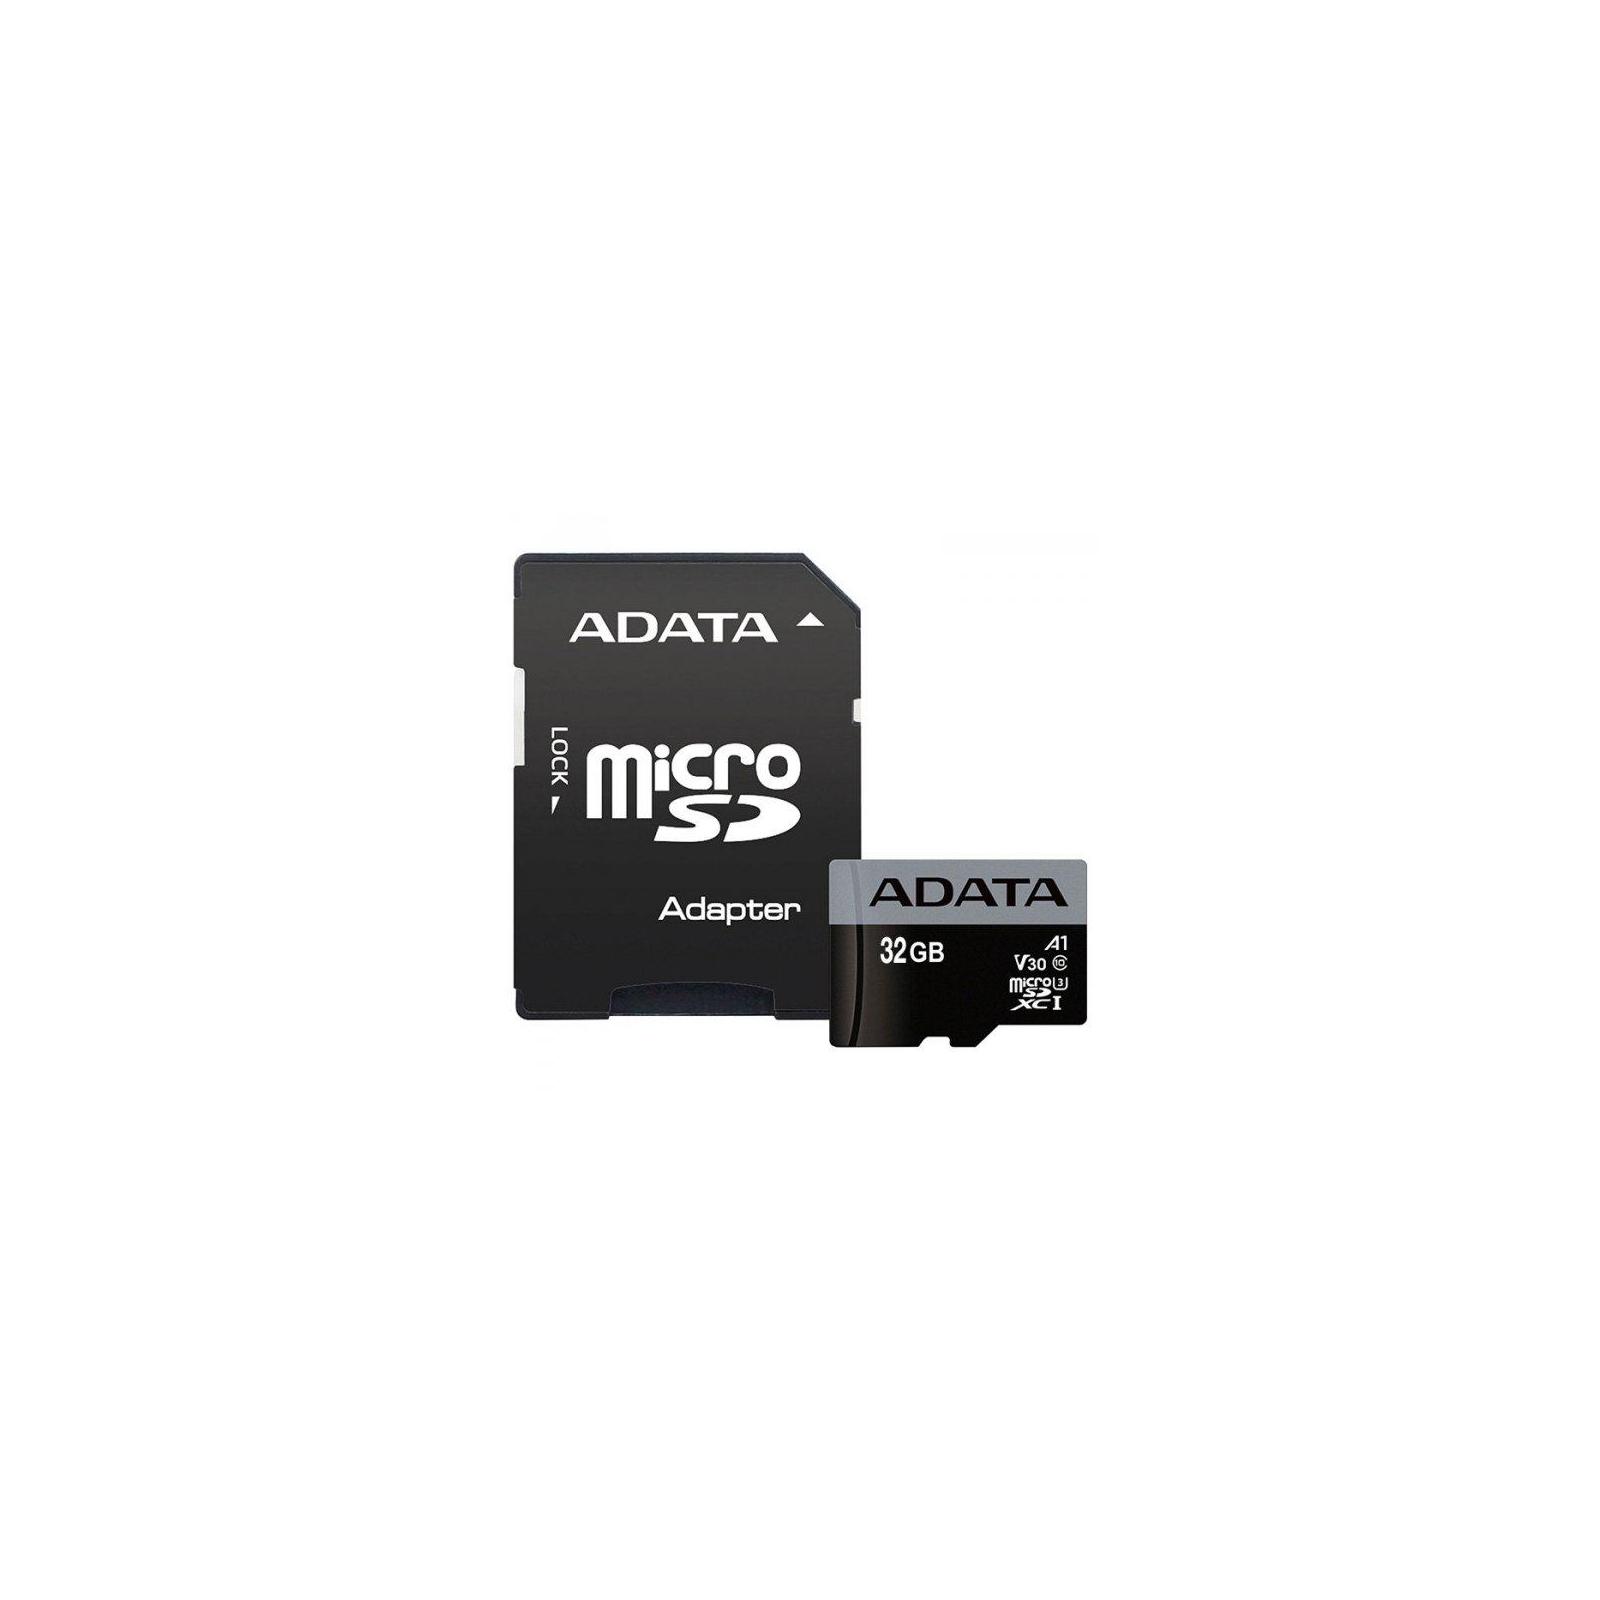 Карта памяти ADATA 32GB microSD class 10 UHS-I U3 A1 (AUSDH32GUI3V30SA1-RA1)